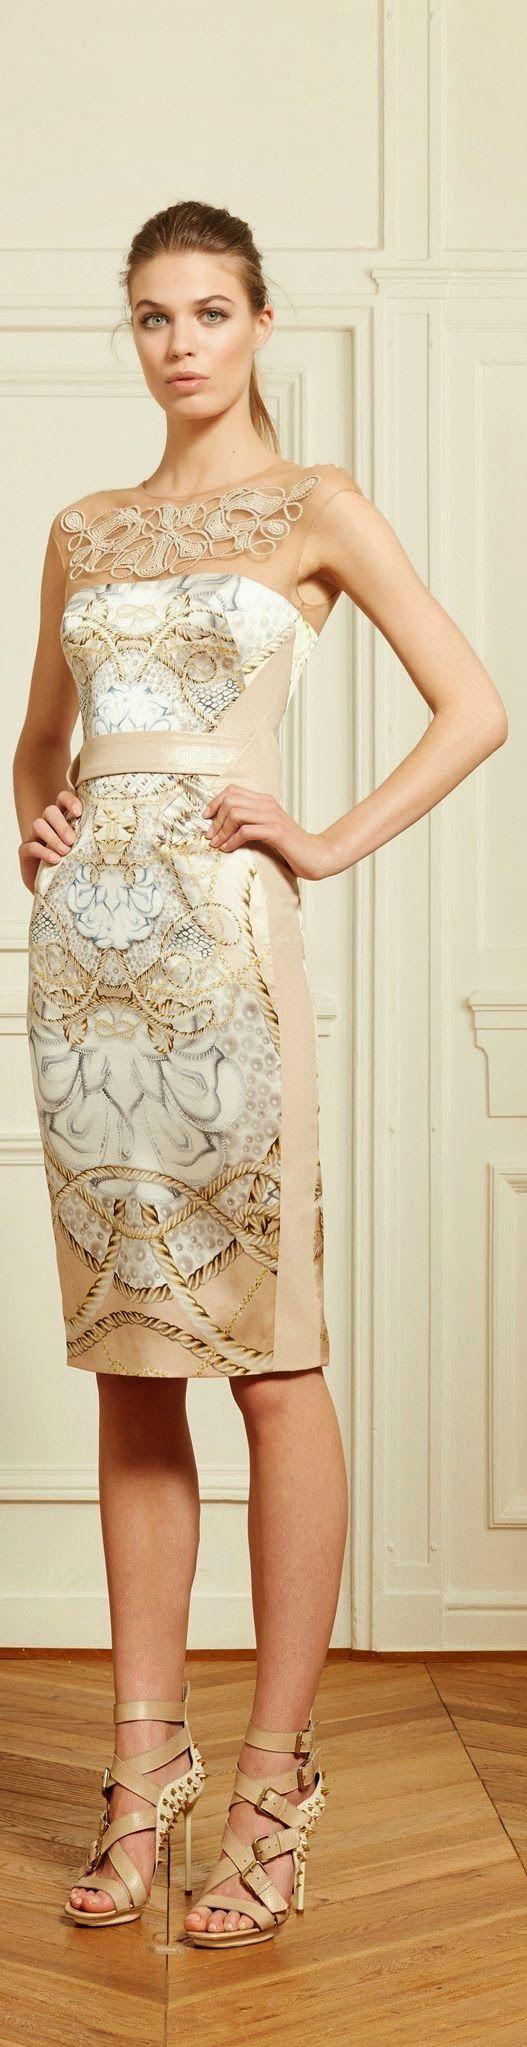 shopprice.com.au is one of the largest online price comparison sites in Australia http://www.shopprice.com.au/women+fashion